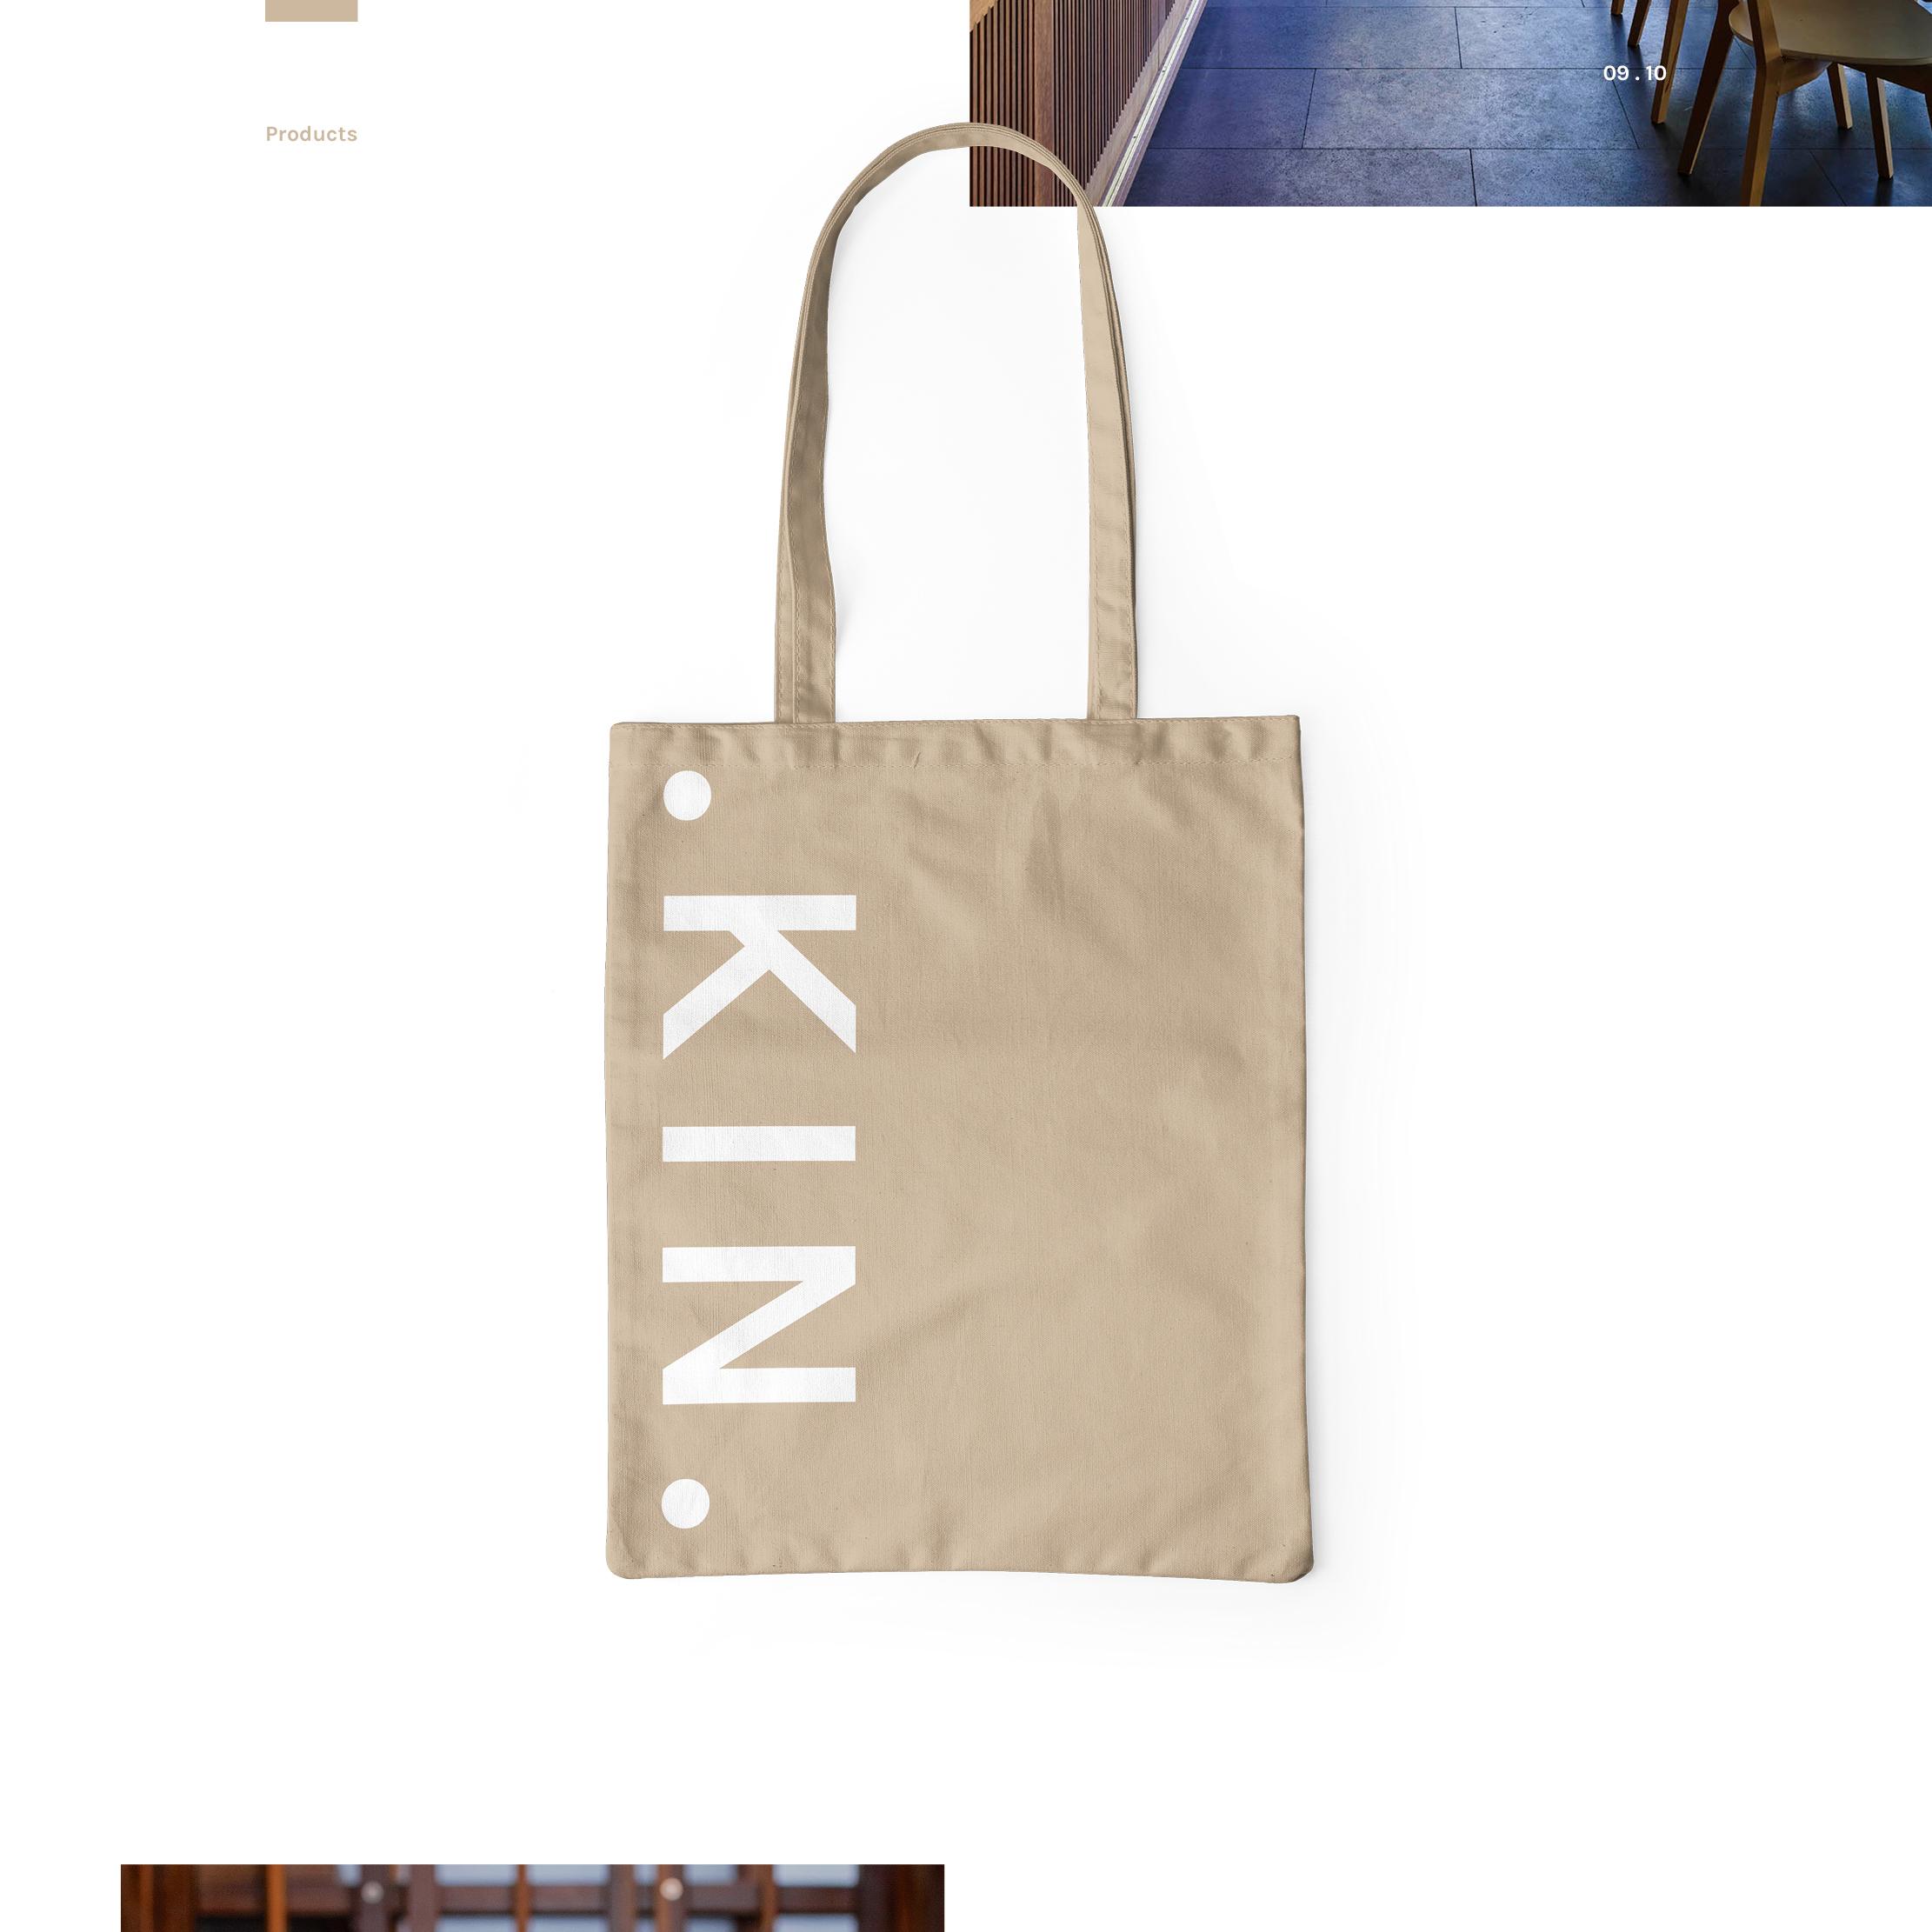 kinarchitects-project-web10.jpg